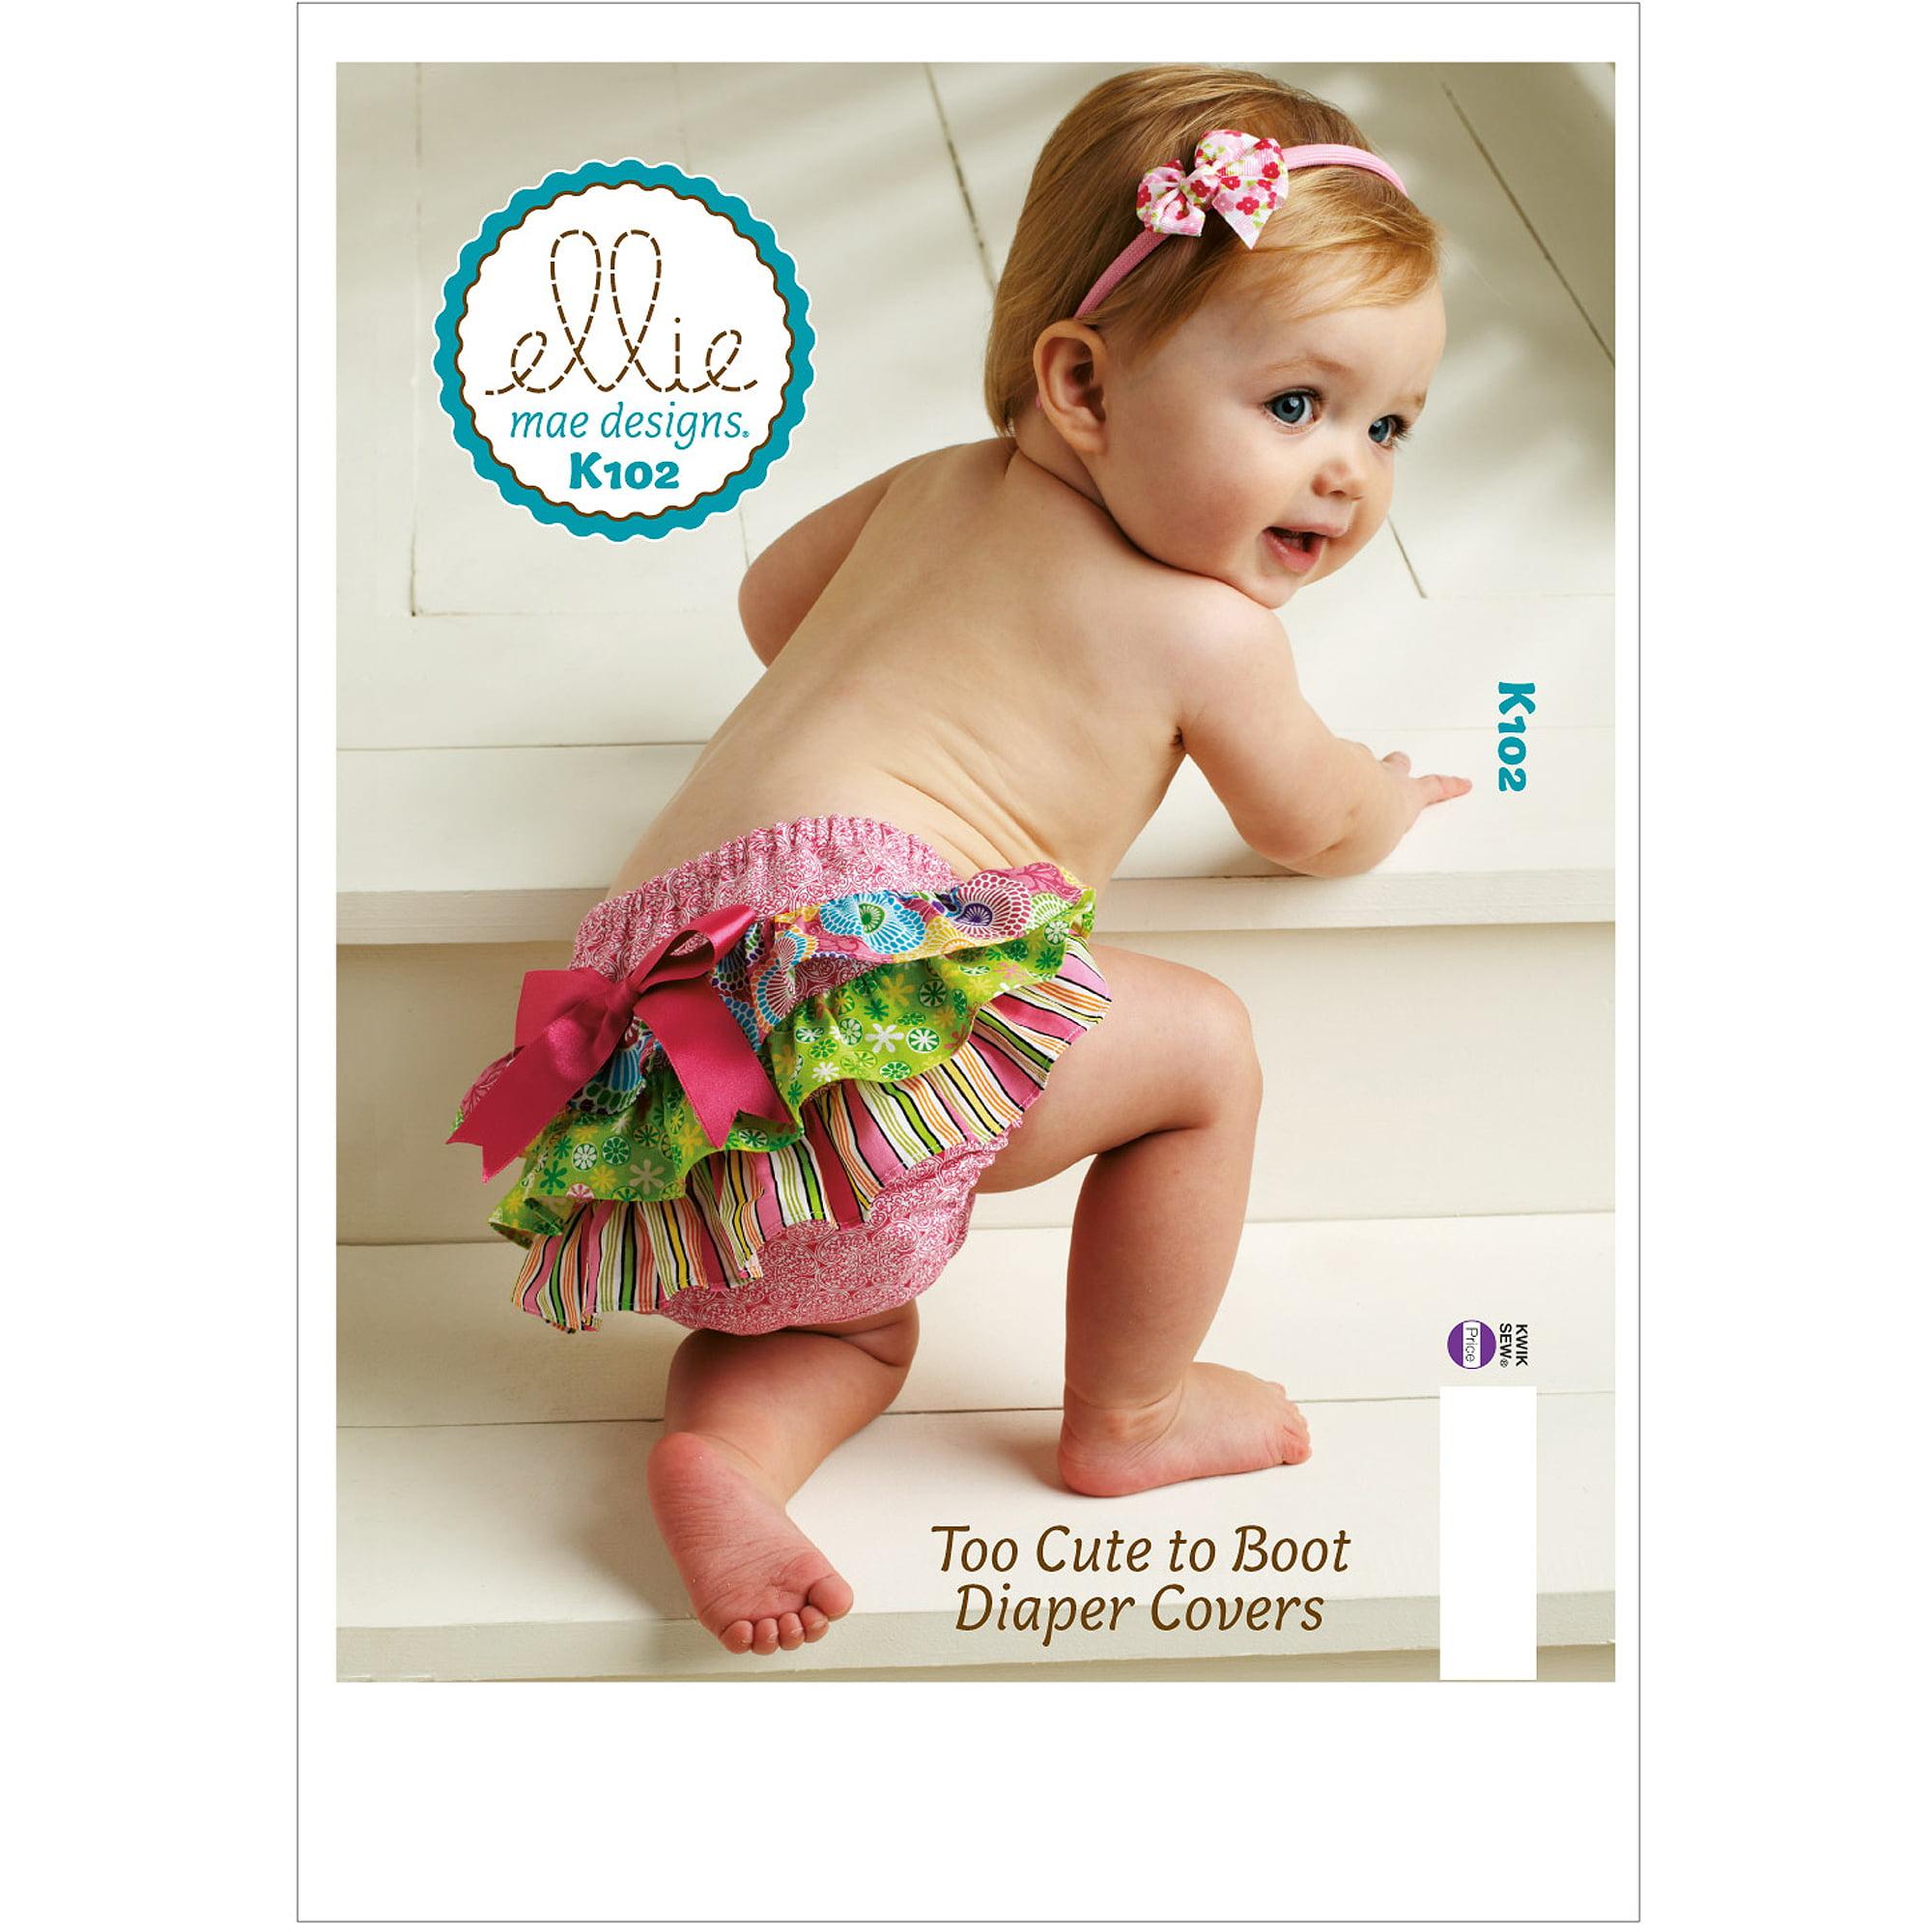 Kwik Sew Pattern Too Cute to Boot Diaper Covers, (XS, S, M, L, XL)